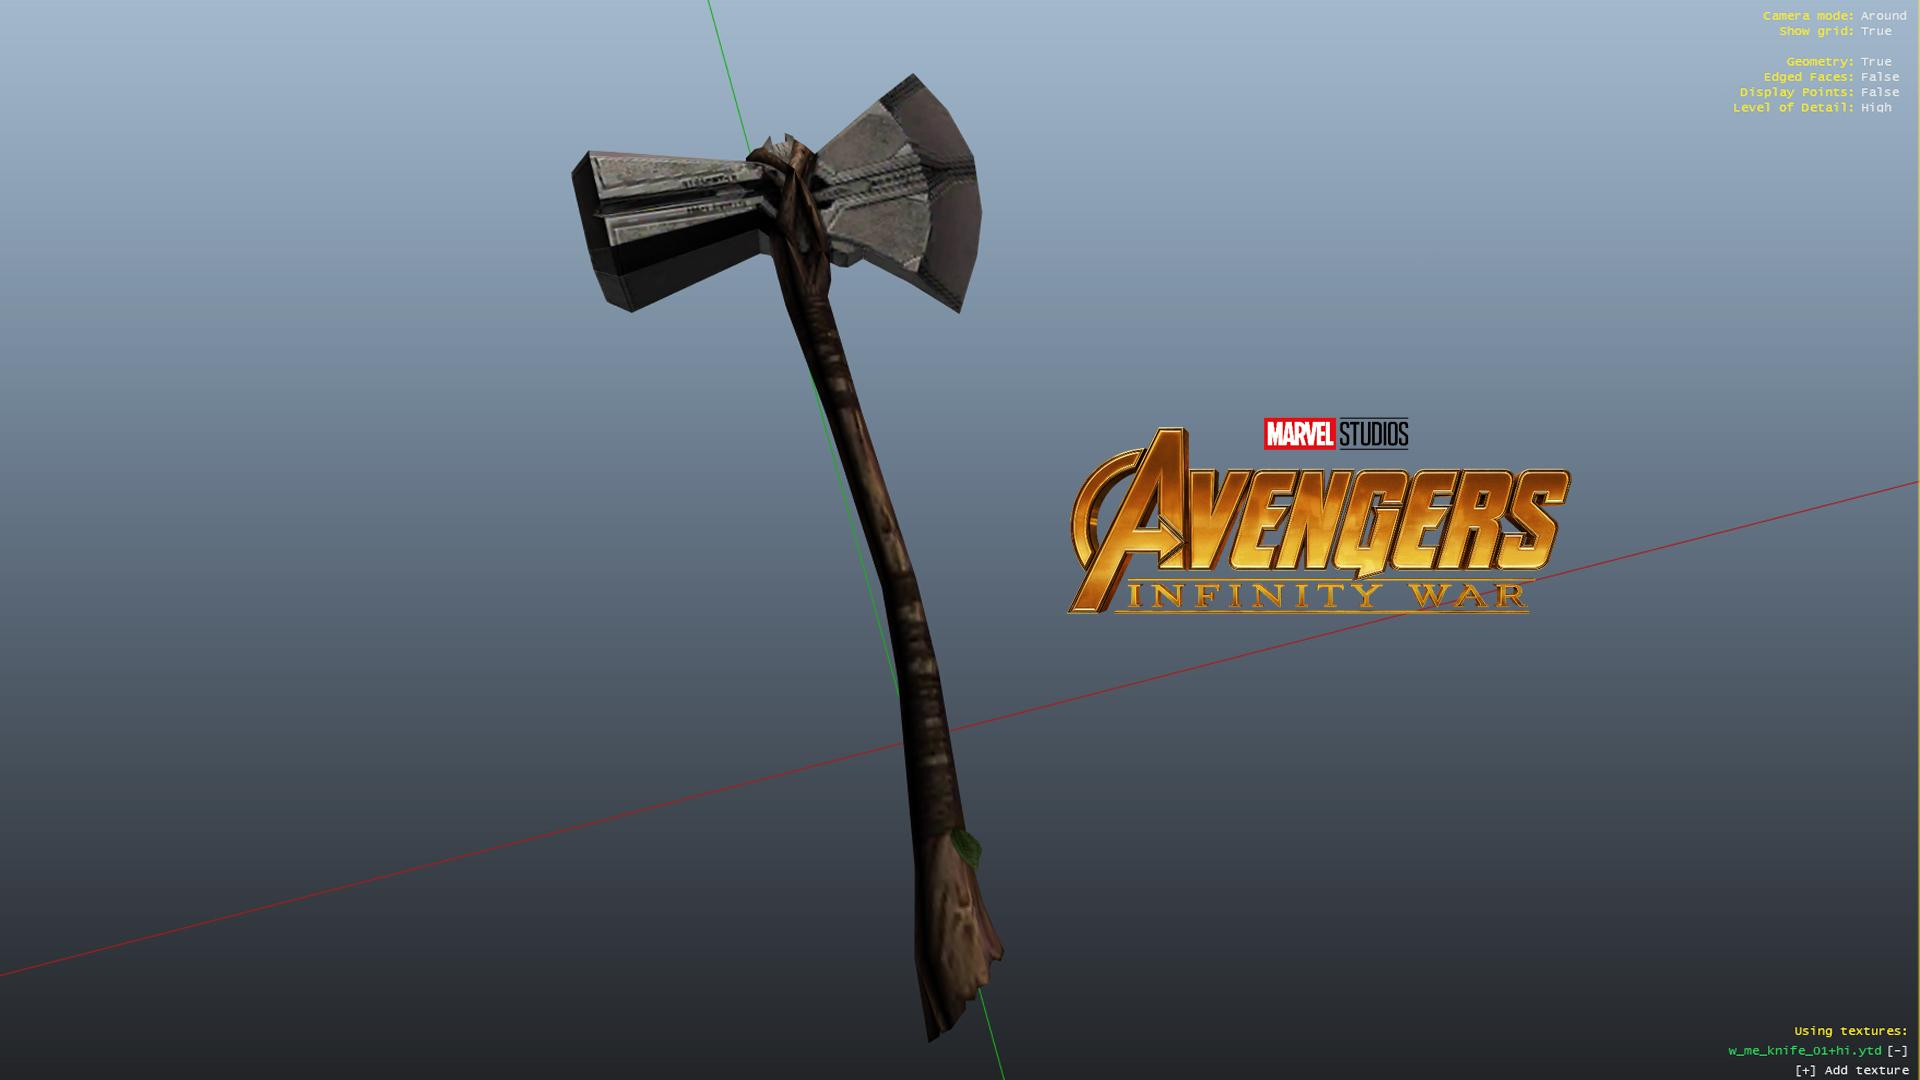 Storm Breaker (Avengers Infinity War Thor's weapon)